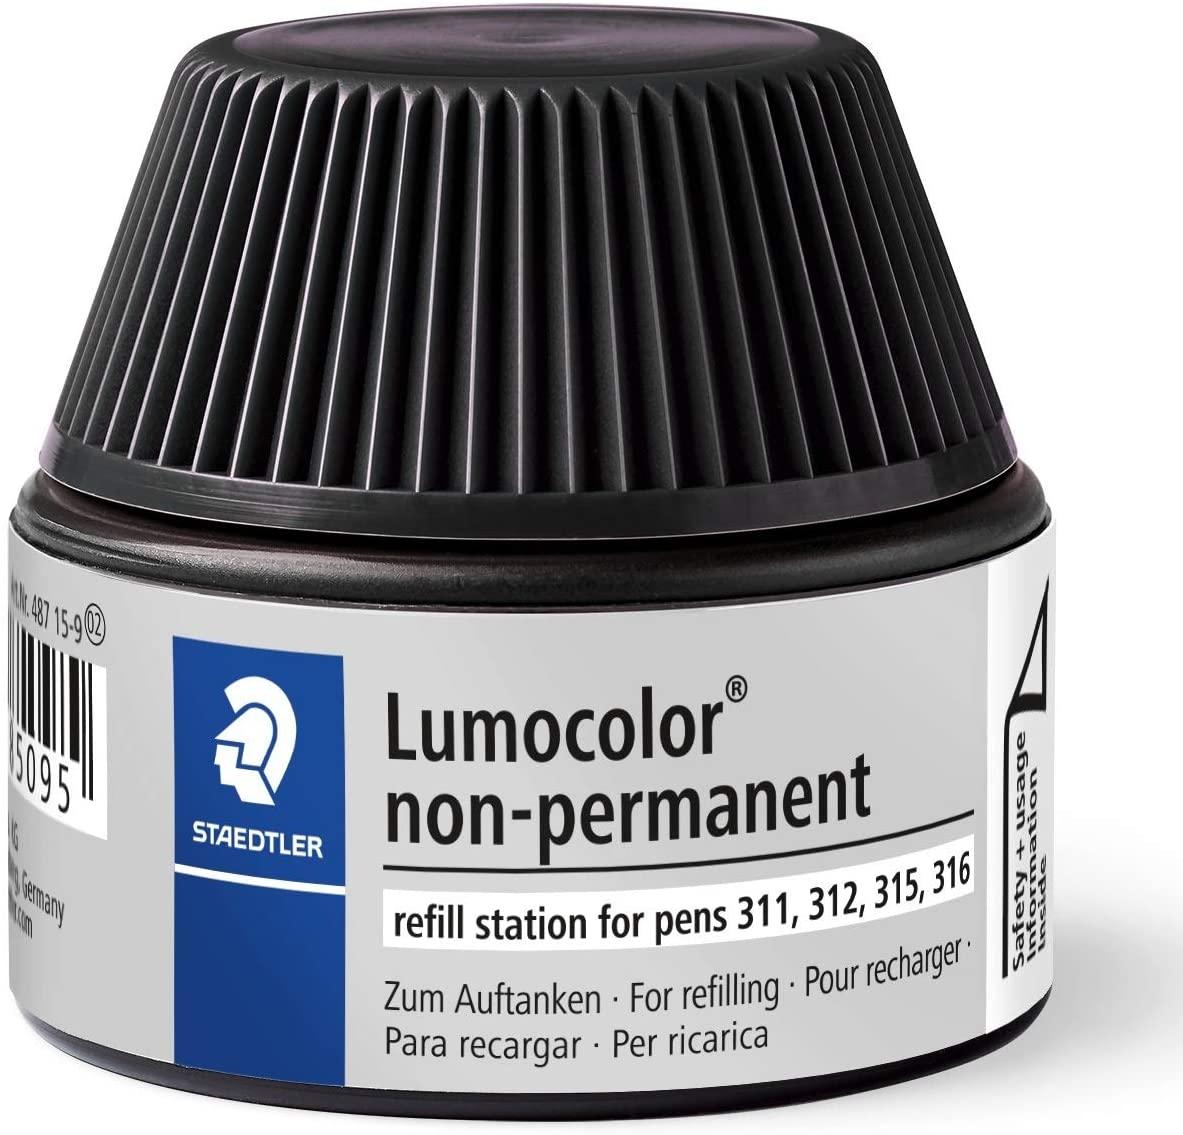 Staedtler Lumocolor Non Permanent Marker Pen Refill - Black